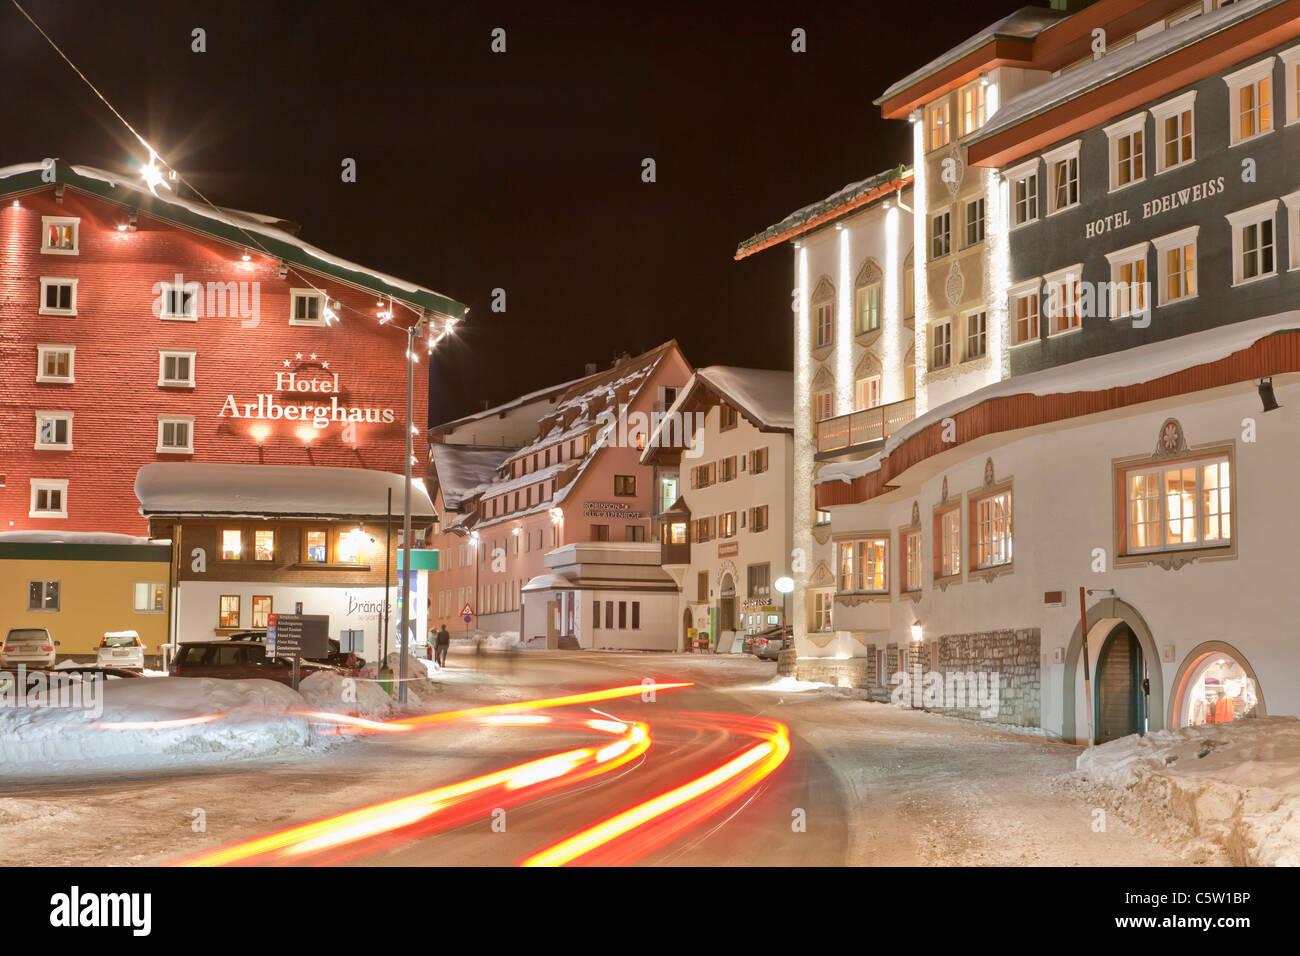 Austria, Vorarlberg, Zurs am Arlberg, View of light trail on main road near hotels in winter - Stock Image